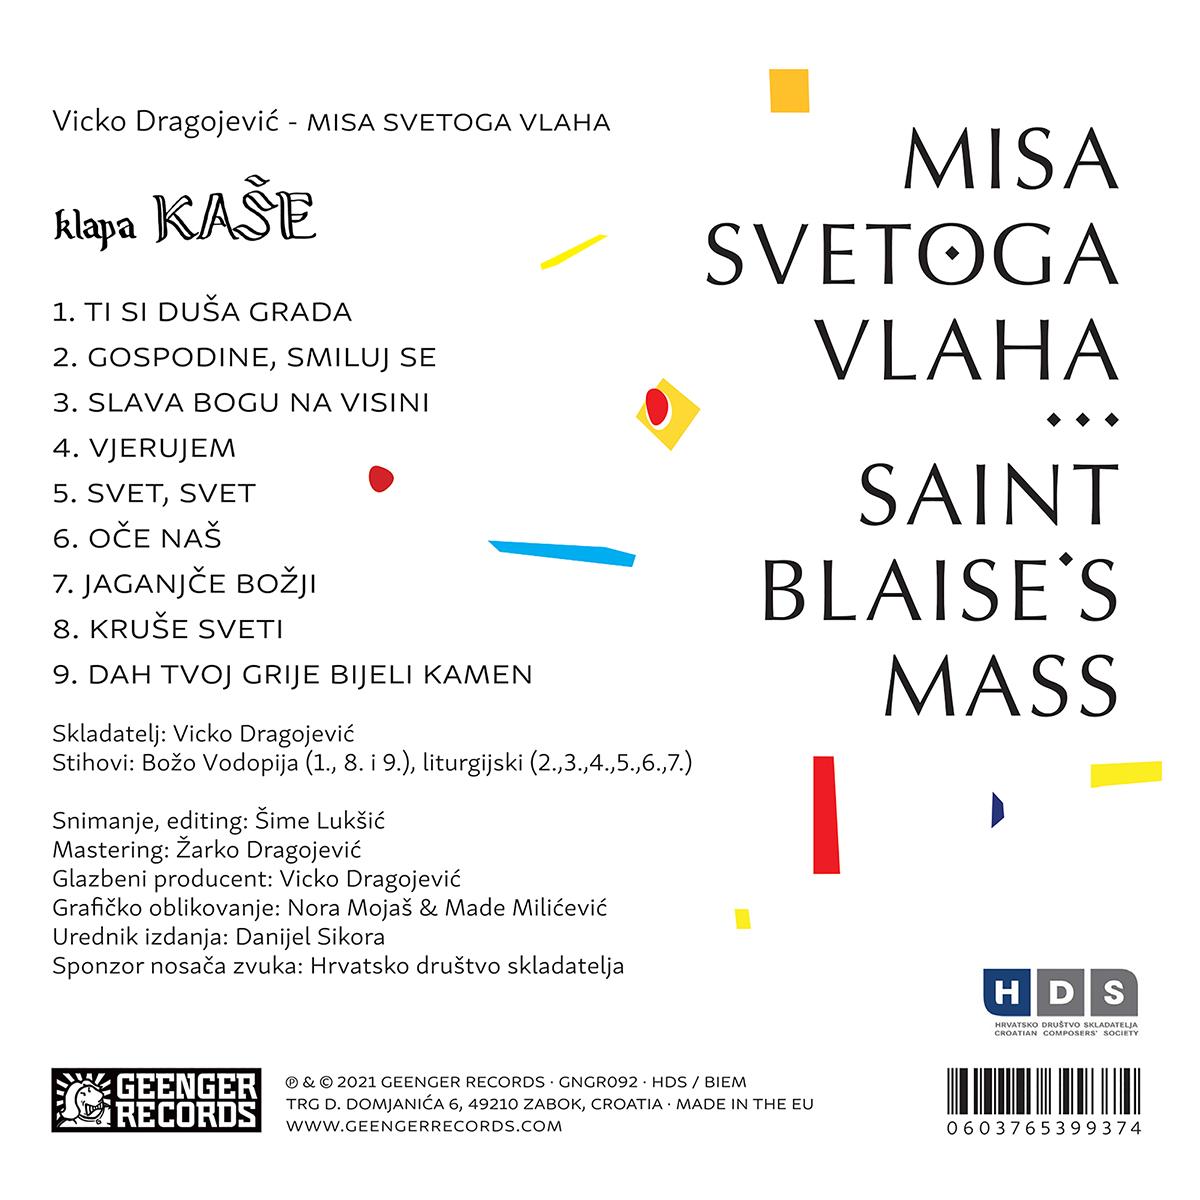 KLAPA KAŠE - Misa svetoga Vlaha